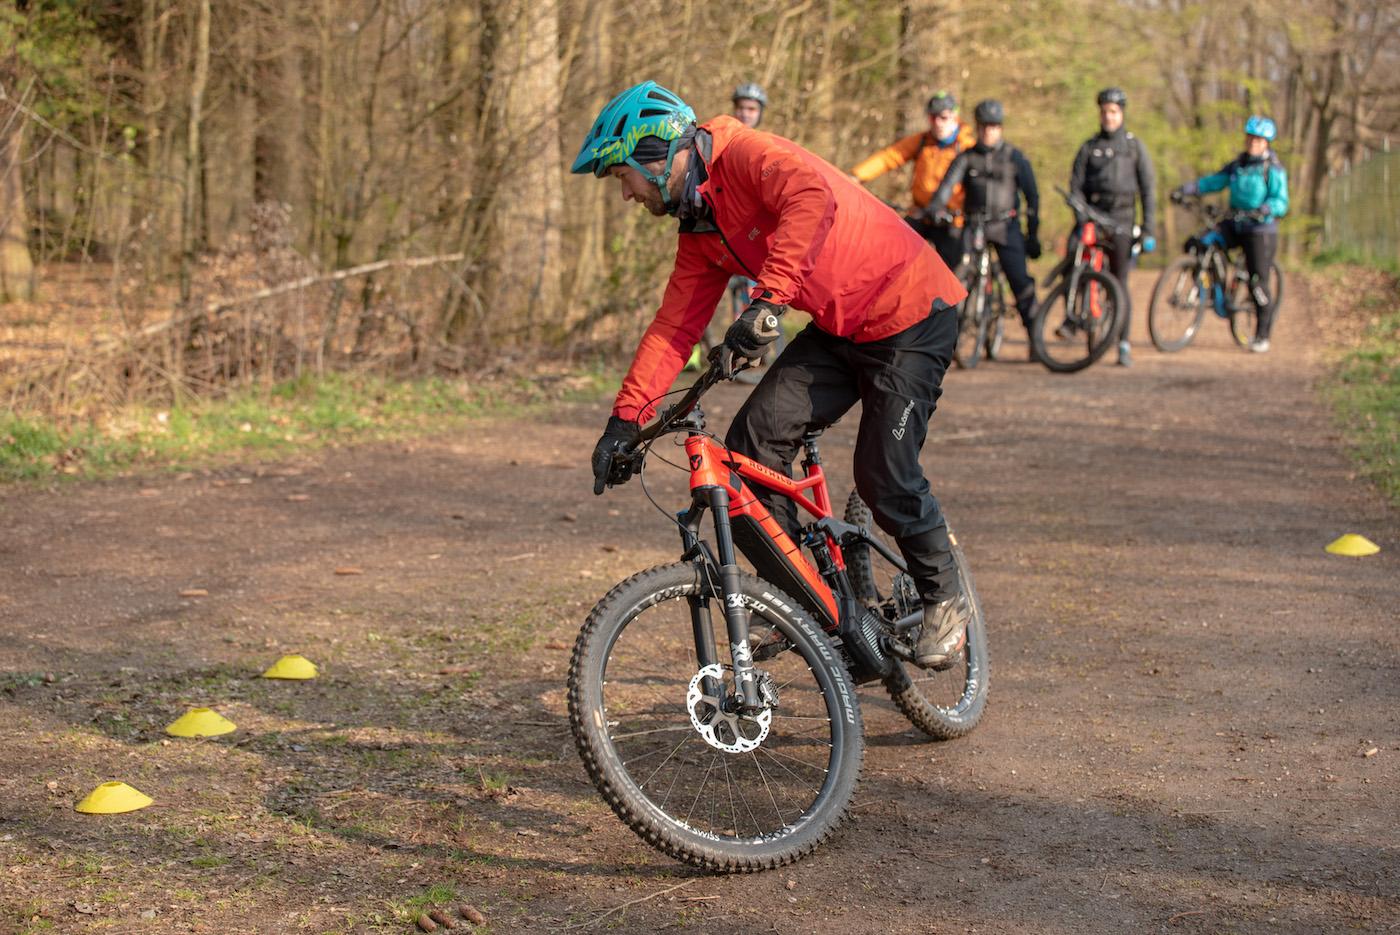 eMTB eBike Fortgeschritten Fahrtechnik Kurs in Siegen - Rock my Trail Bikeschule312